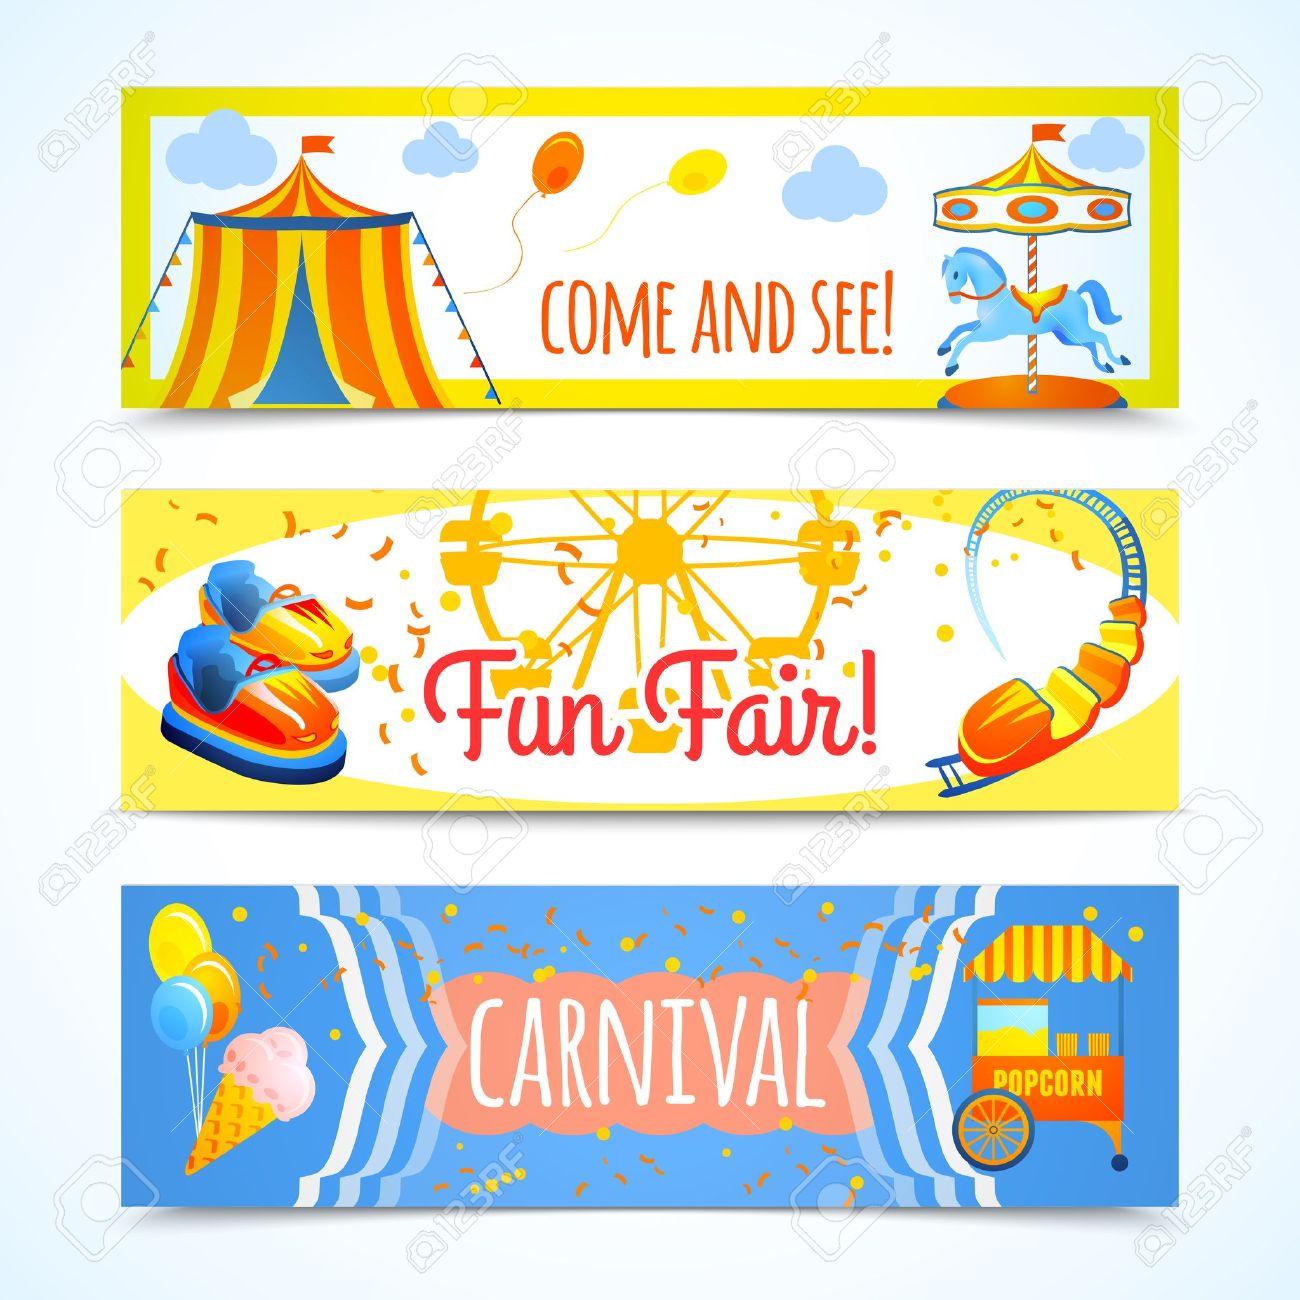 Amusement Entertainment Carnival Theme Park Fun Fair Horizontal.